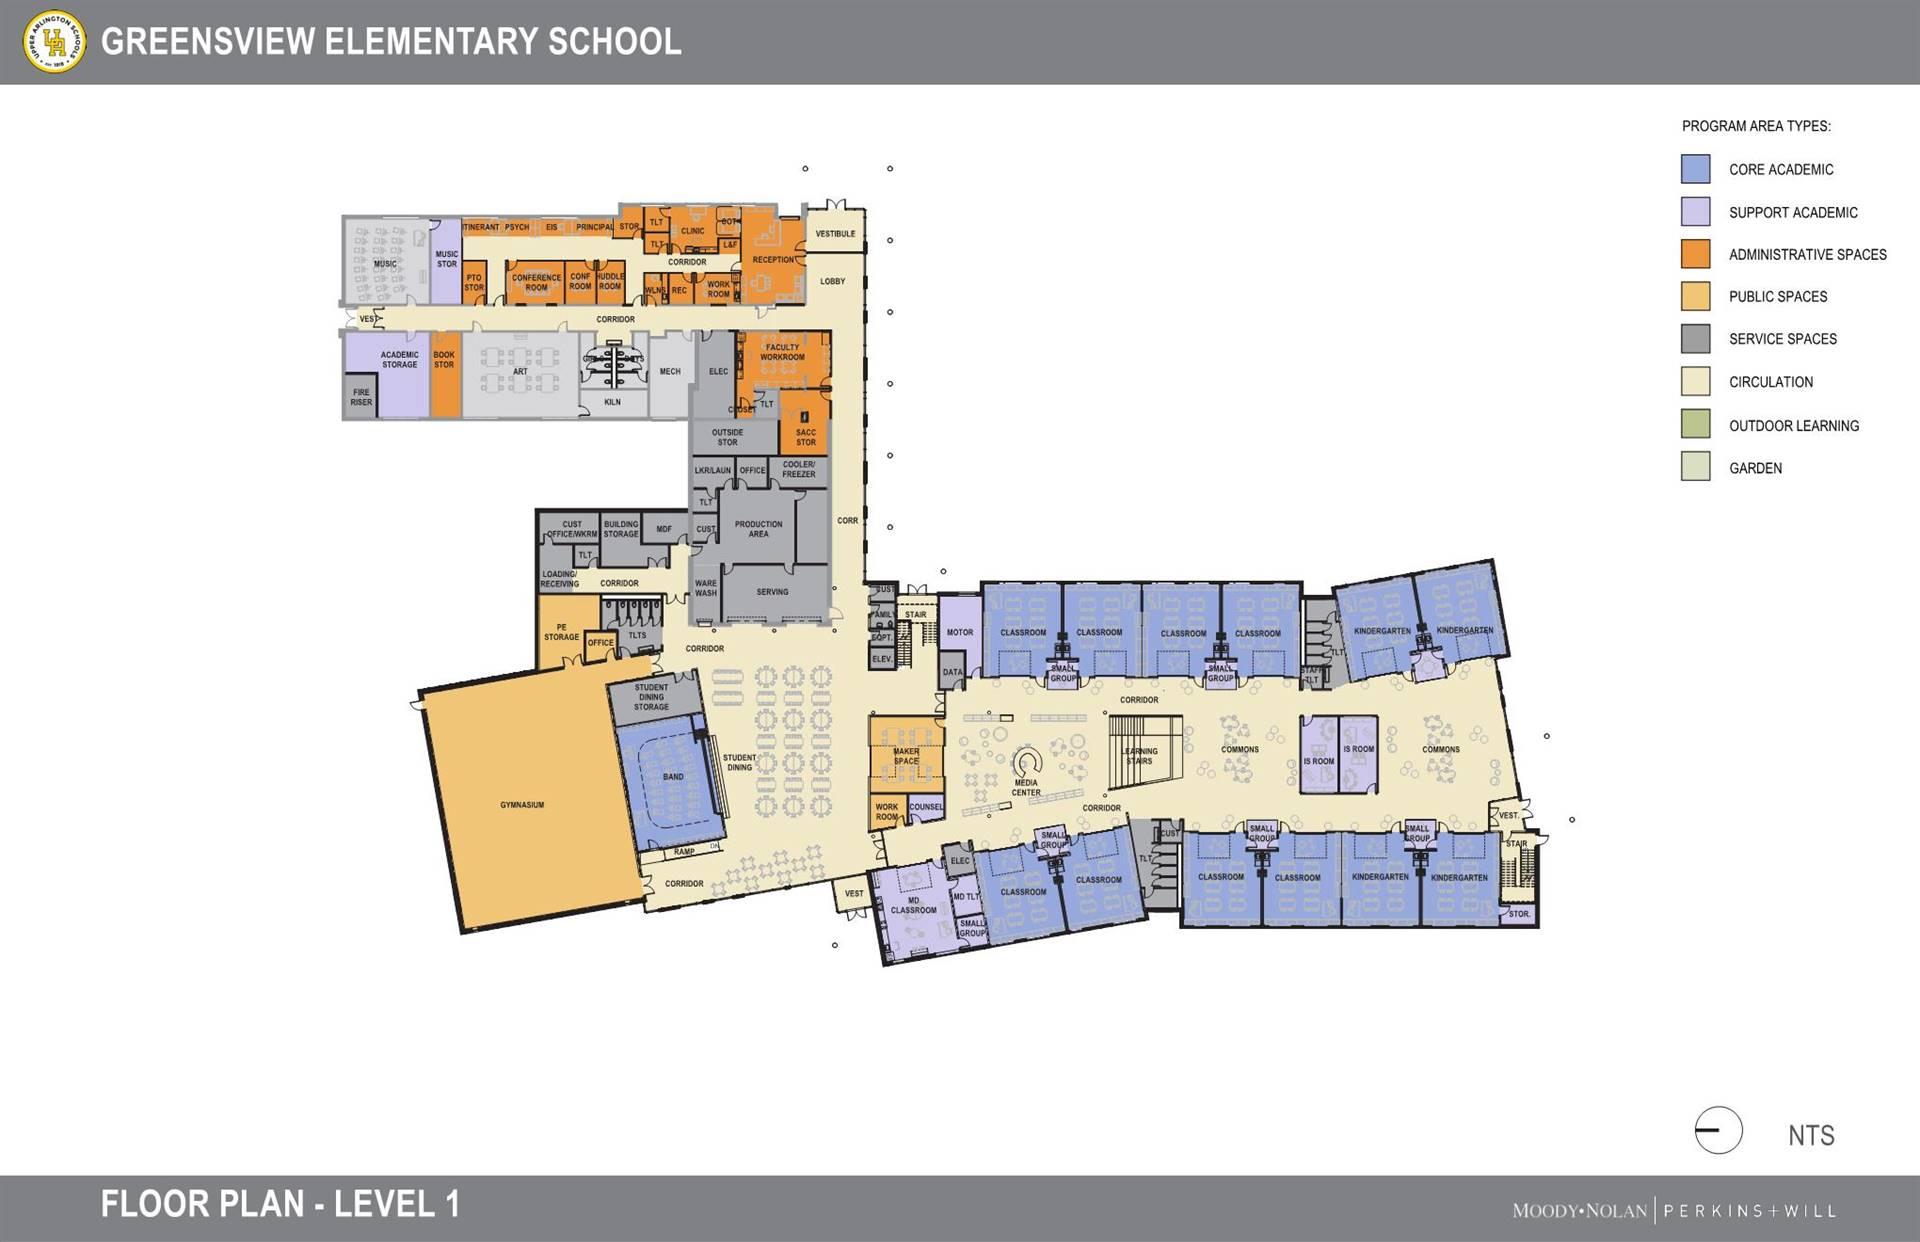 Greensview Elementary School